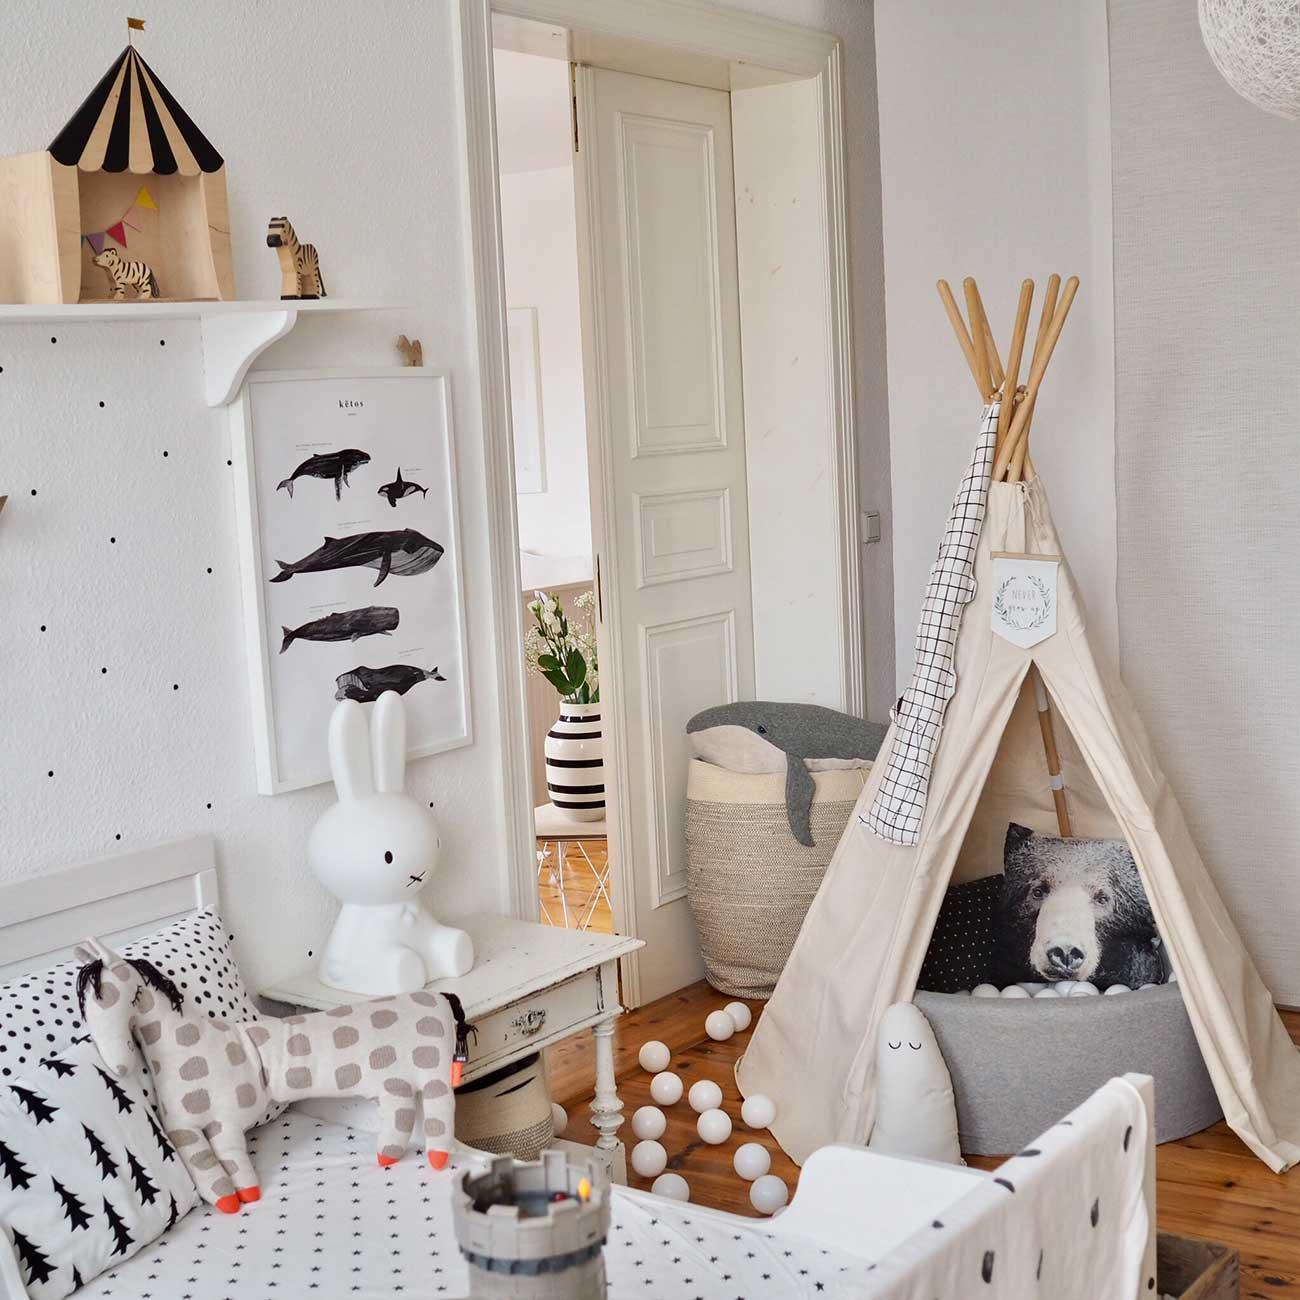 Full Size of Raumteiler Kinderzimmer Regal Weiß Sofa Regale Kinderzimmer Raumteiler Kinderzimmer